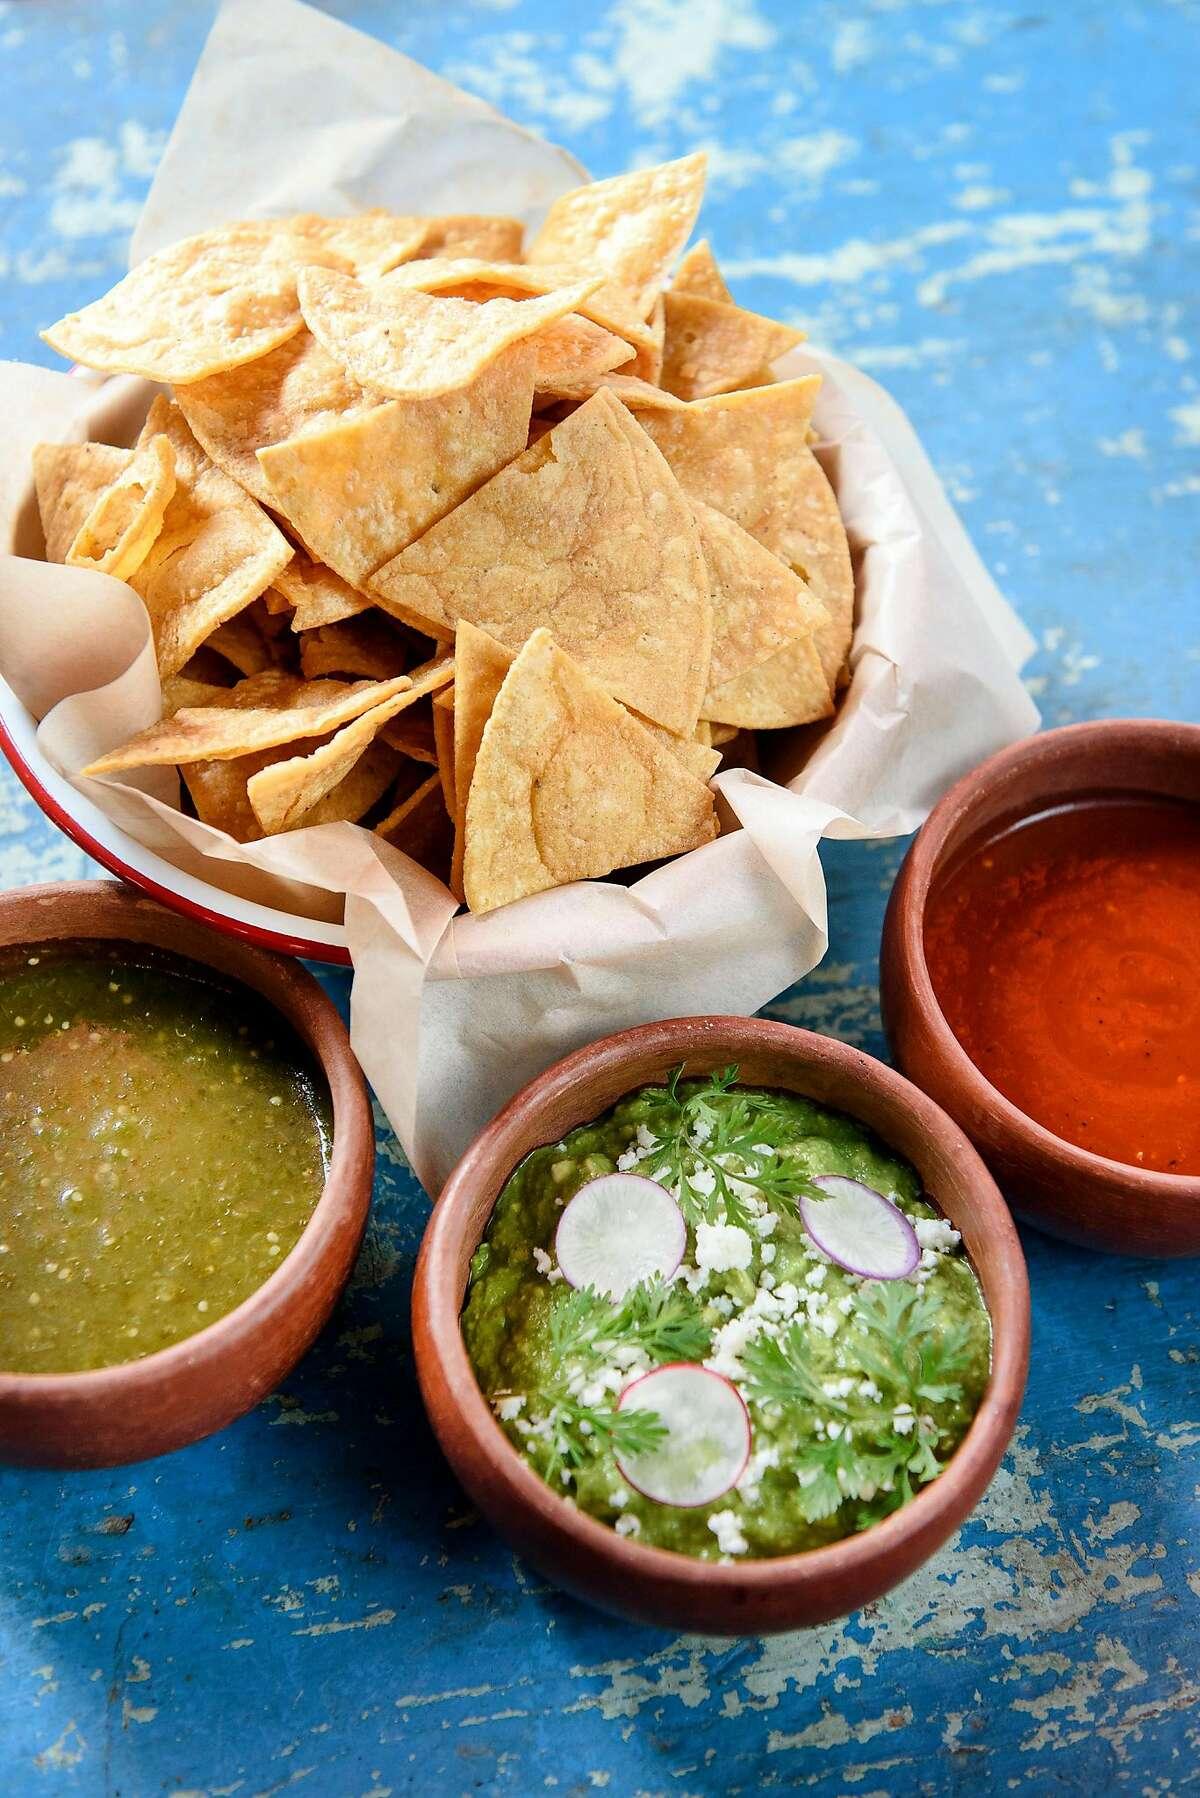 The Totopos, Guacamole y Salsa: tortilla chips, guacamole, salsa verde, salsa mixe, at La Calenda restaurant in Yountville, Calif., on Wednesday February 27, 2019.